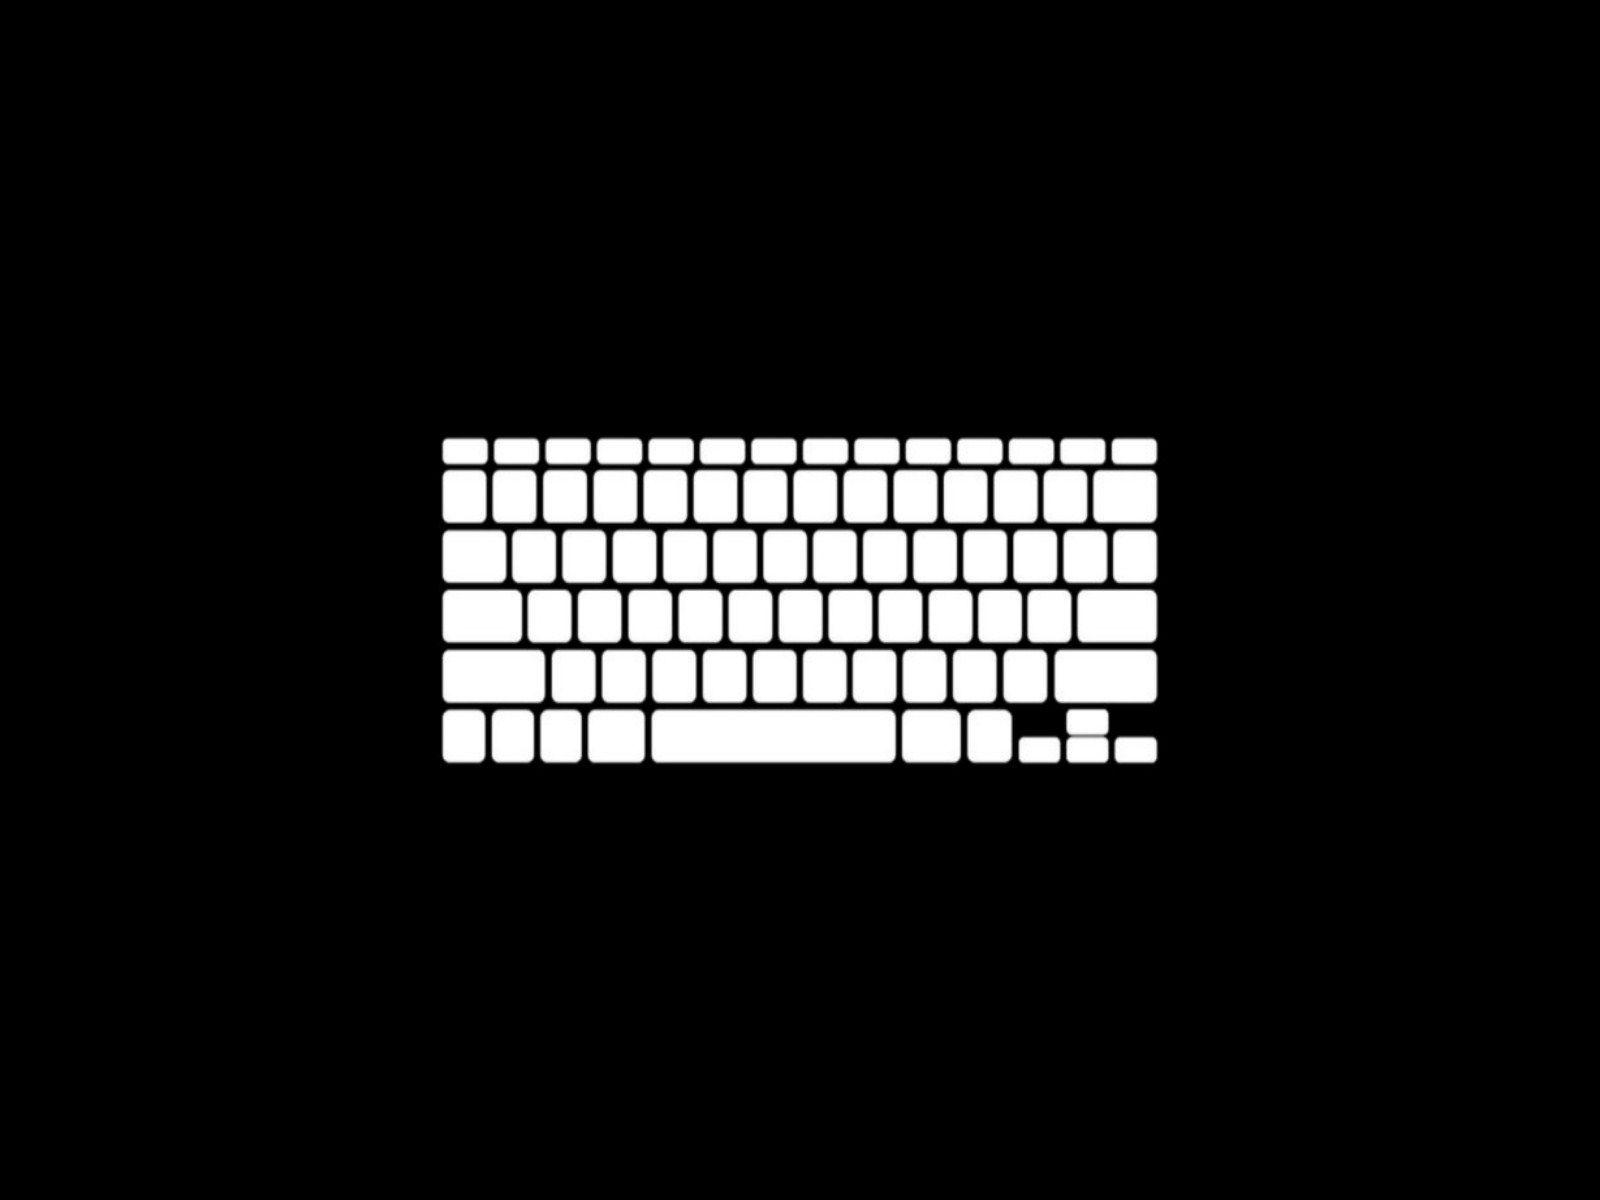 Black Mac Wallpaper 1600 1200 Black Mac Backgrounds (43 Wallpapers)